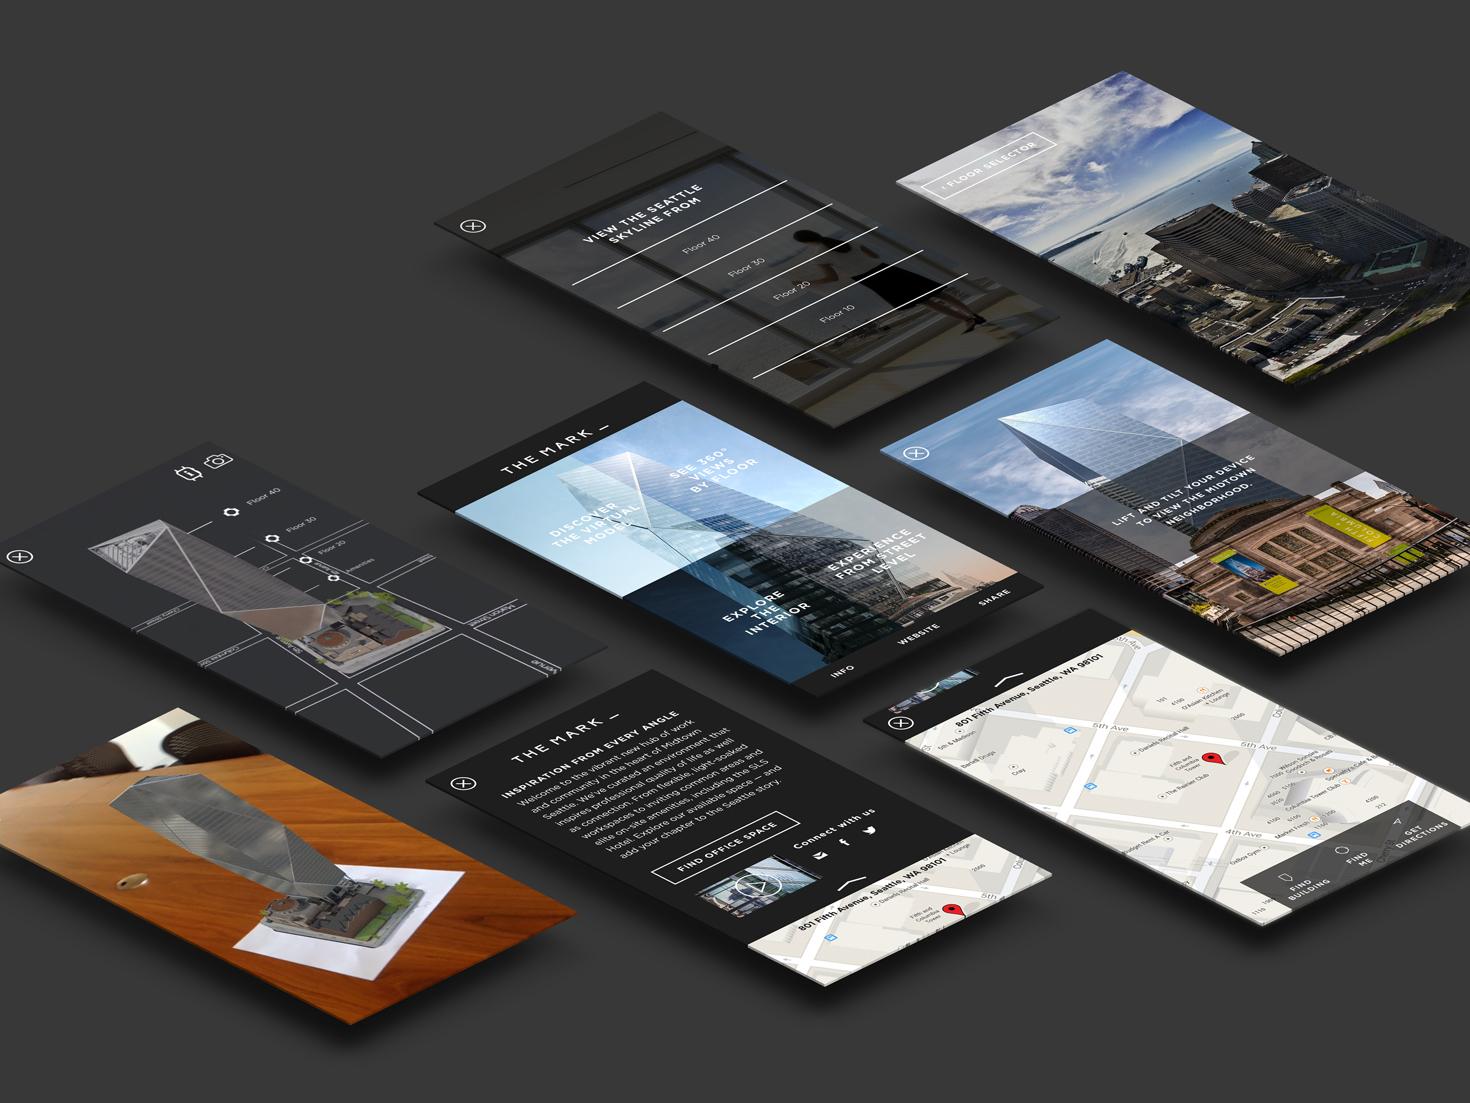 The-Mark-mobile-screens-01.jpg